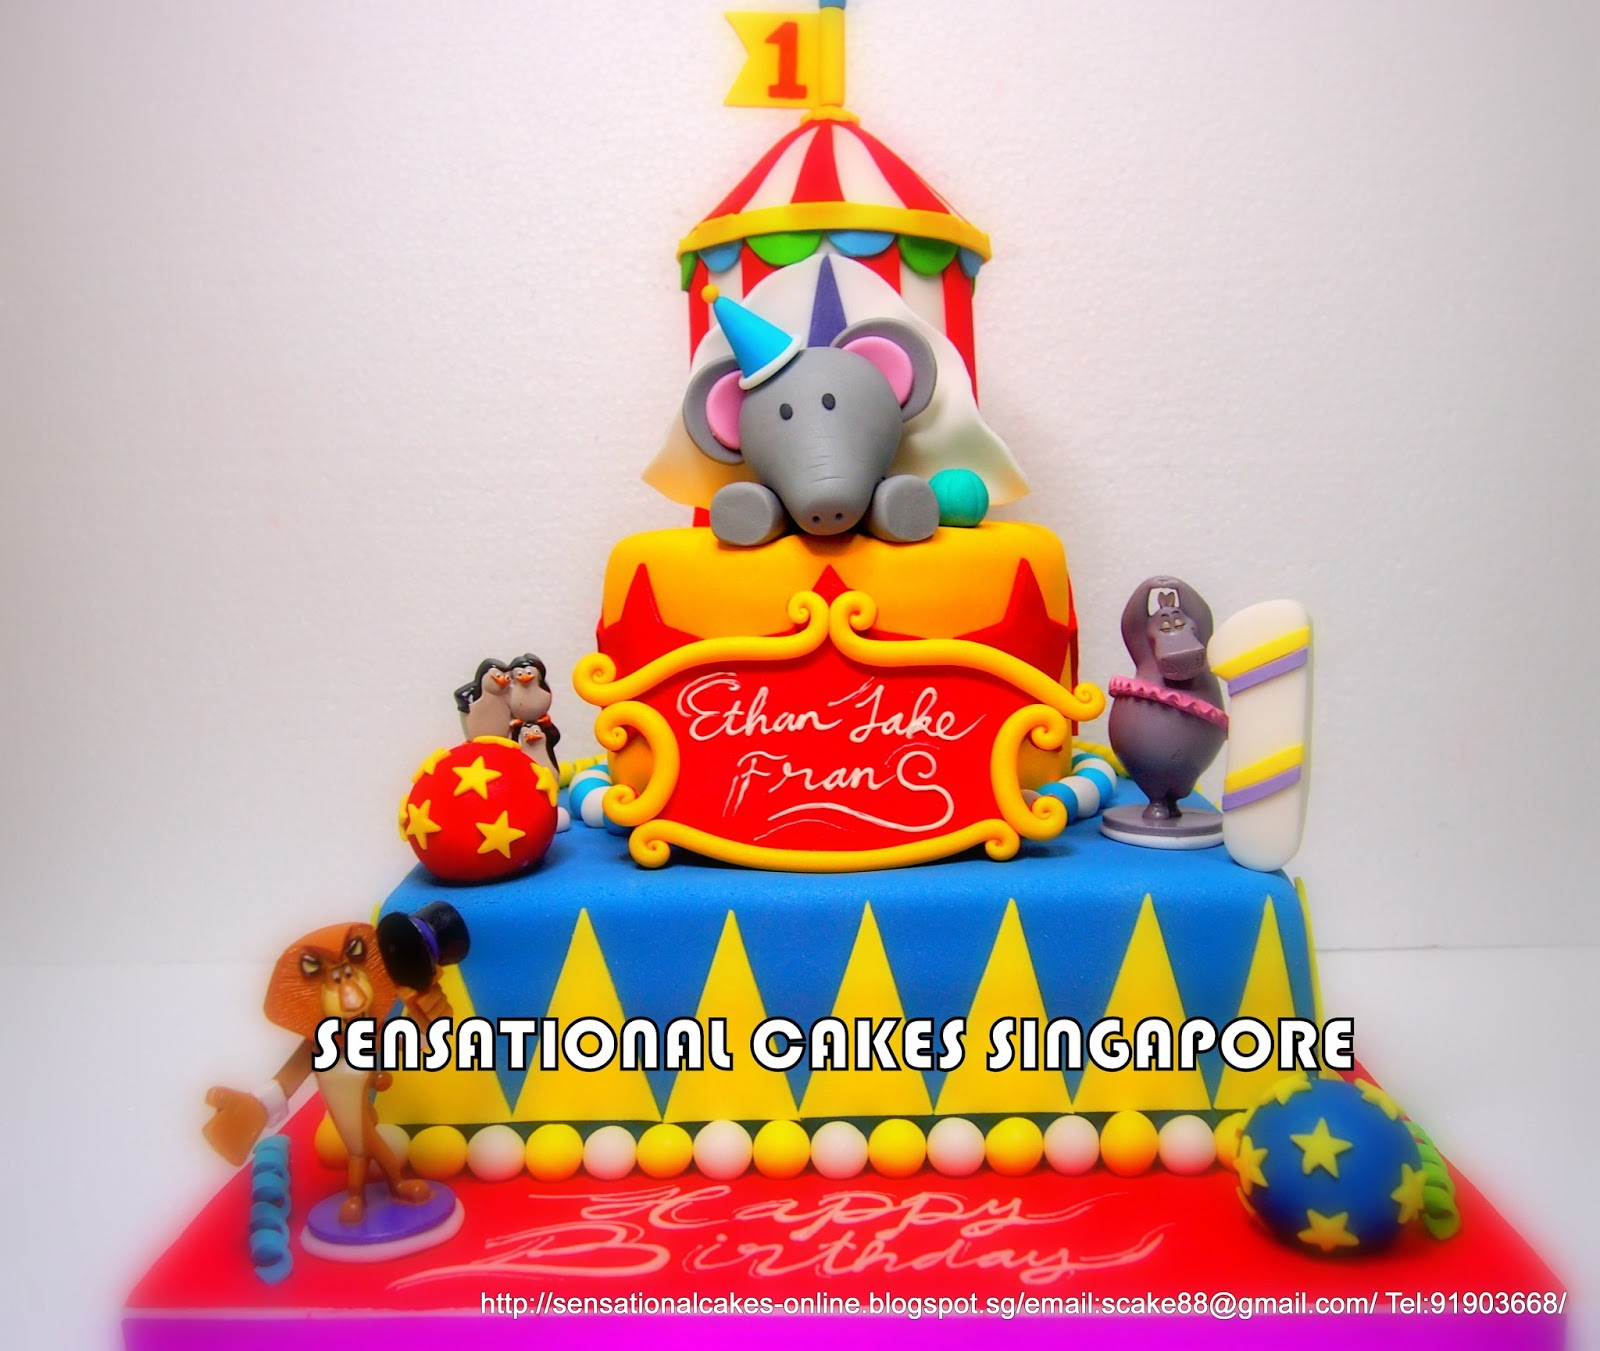 The Sensational Cakes CIRCUS MASTERPIECE MADAGASCAR 3 CIRCUS CAKE